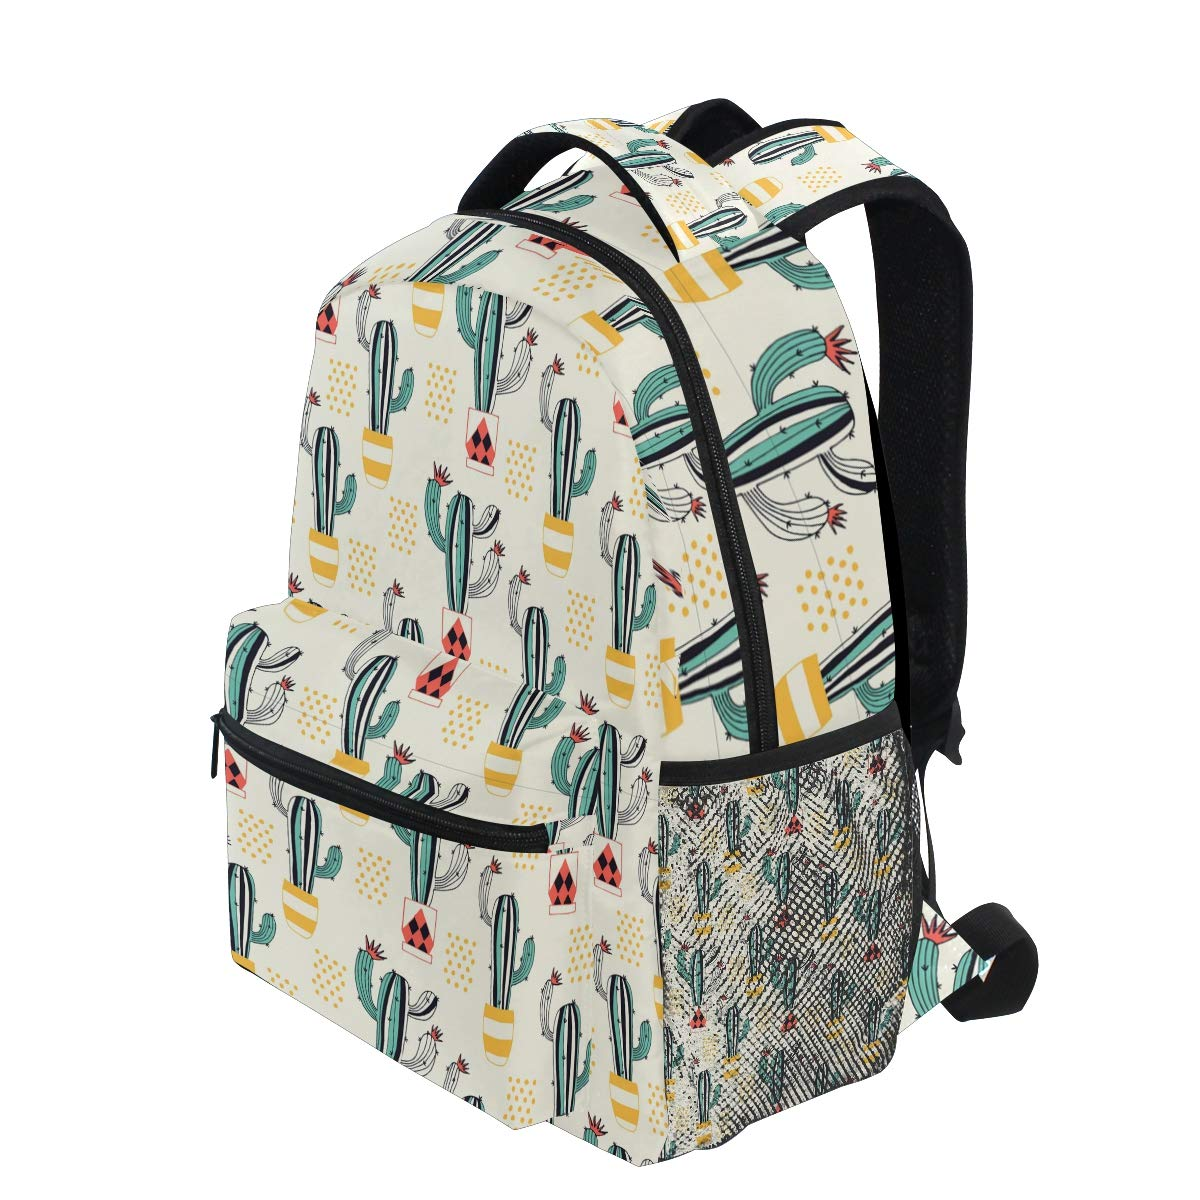 Travel Duffels Yellow Background Cactus Planter Large Travel Duffel Bag For Women Men Overnight Weekend Lightweight Luggage Bag